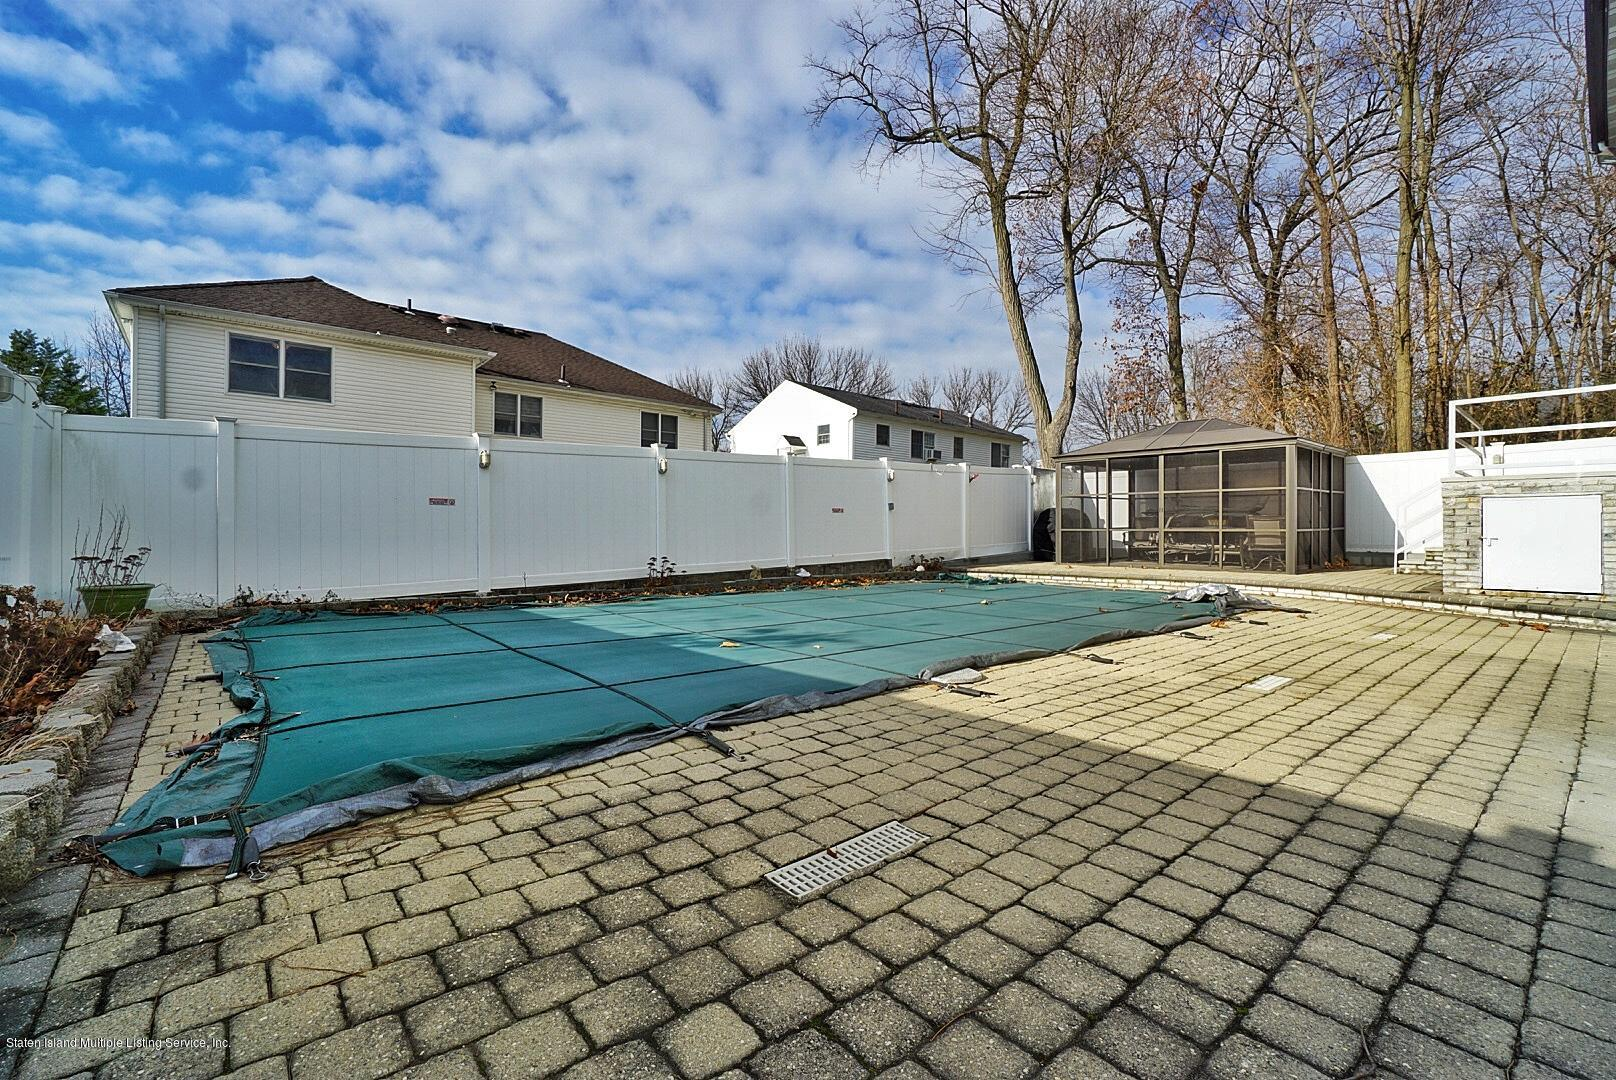 Two Family - Detached 360 Main Street  Staten Island, NY 10307, MLS-1124744-49